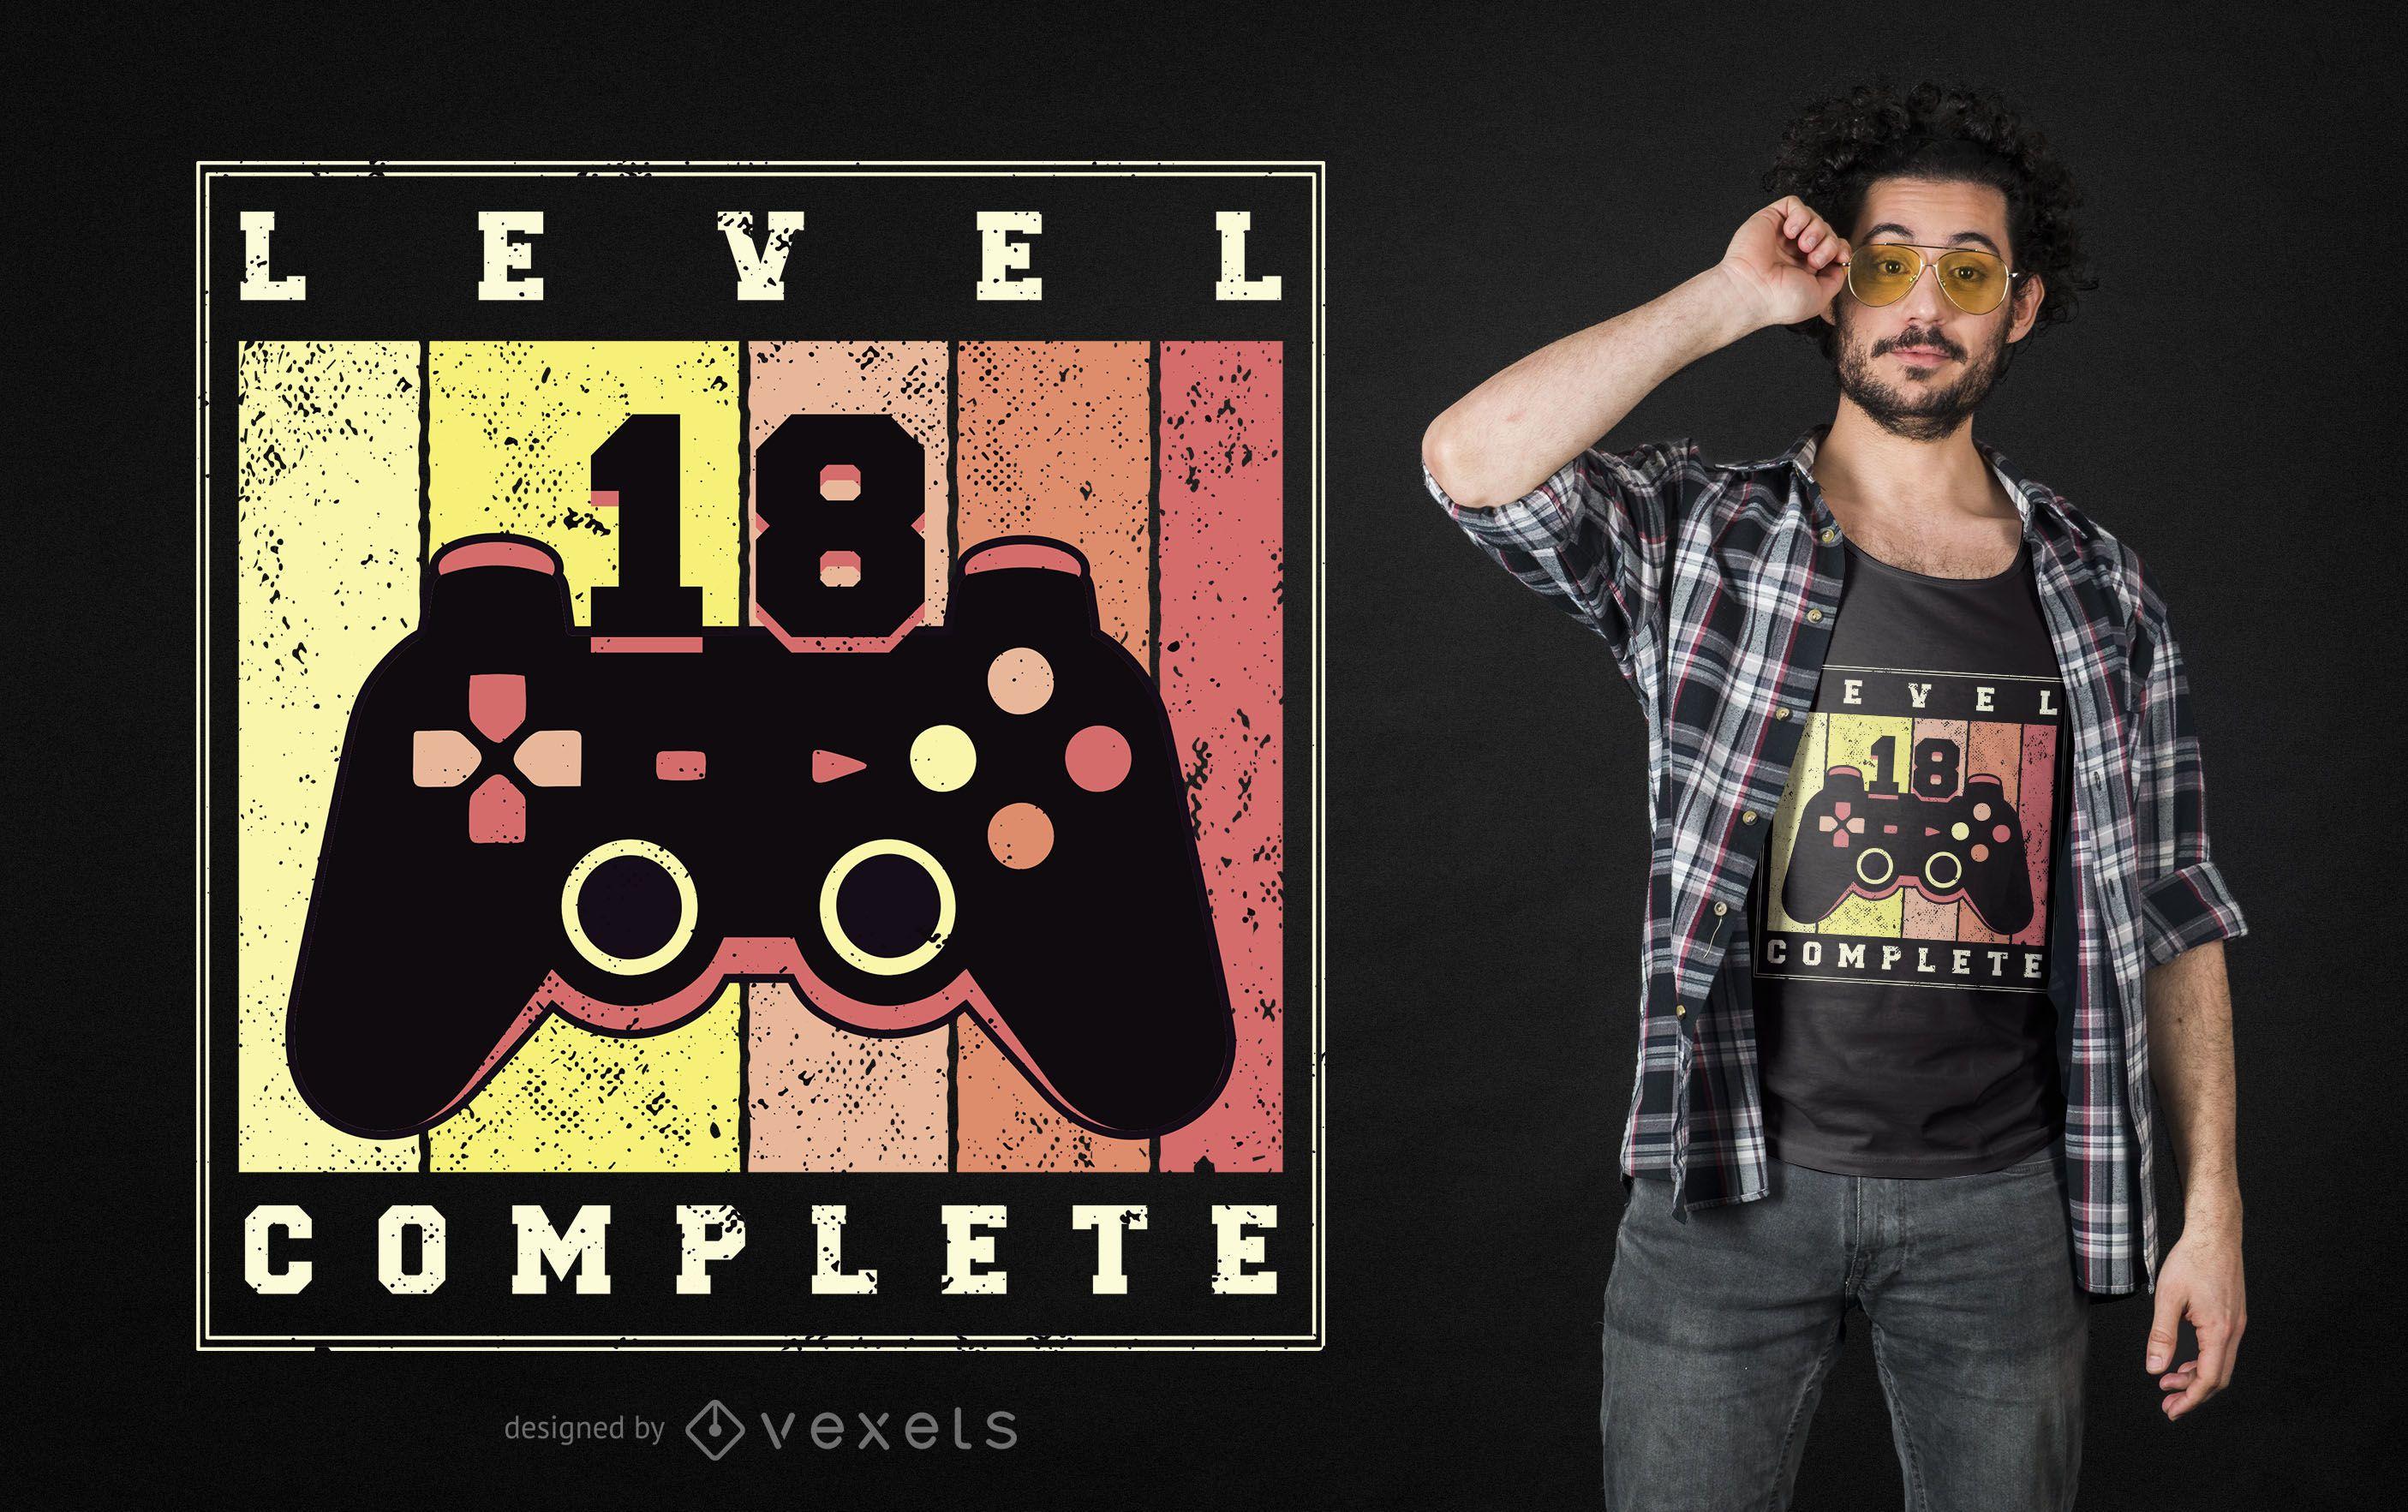 Level complete editable t-shirt design